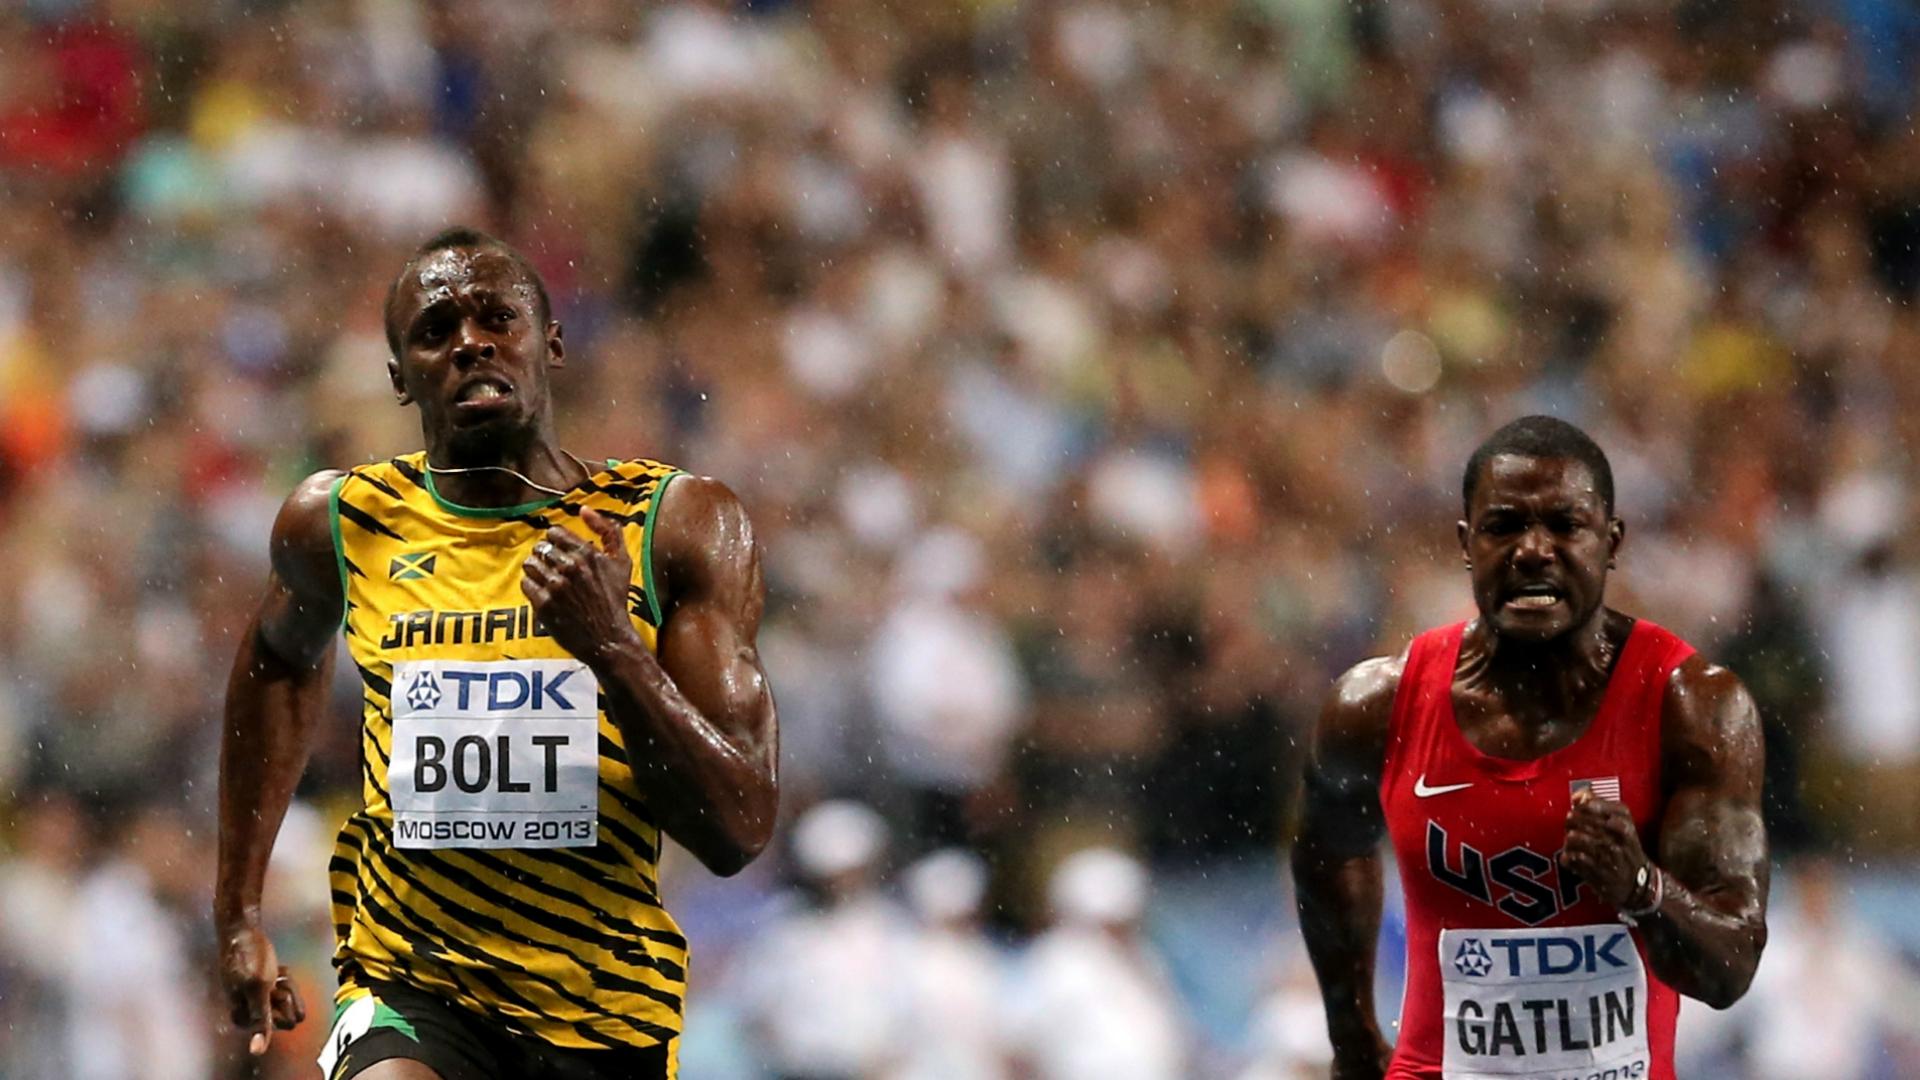 Rio Olympics 2016 Usain Bolt Says US Sprinter Justin Gatlin Will Feel My Wrath